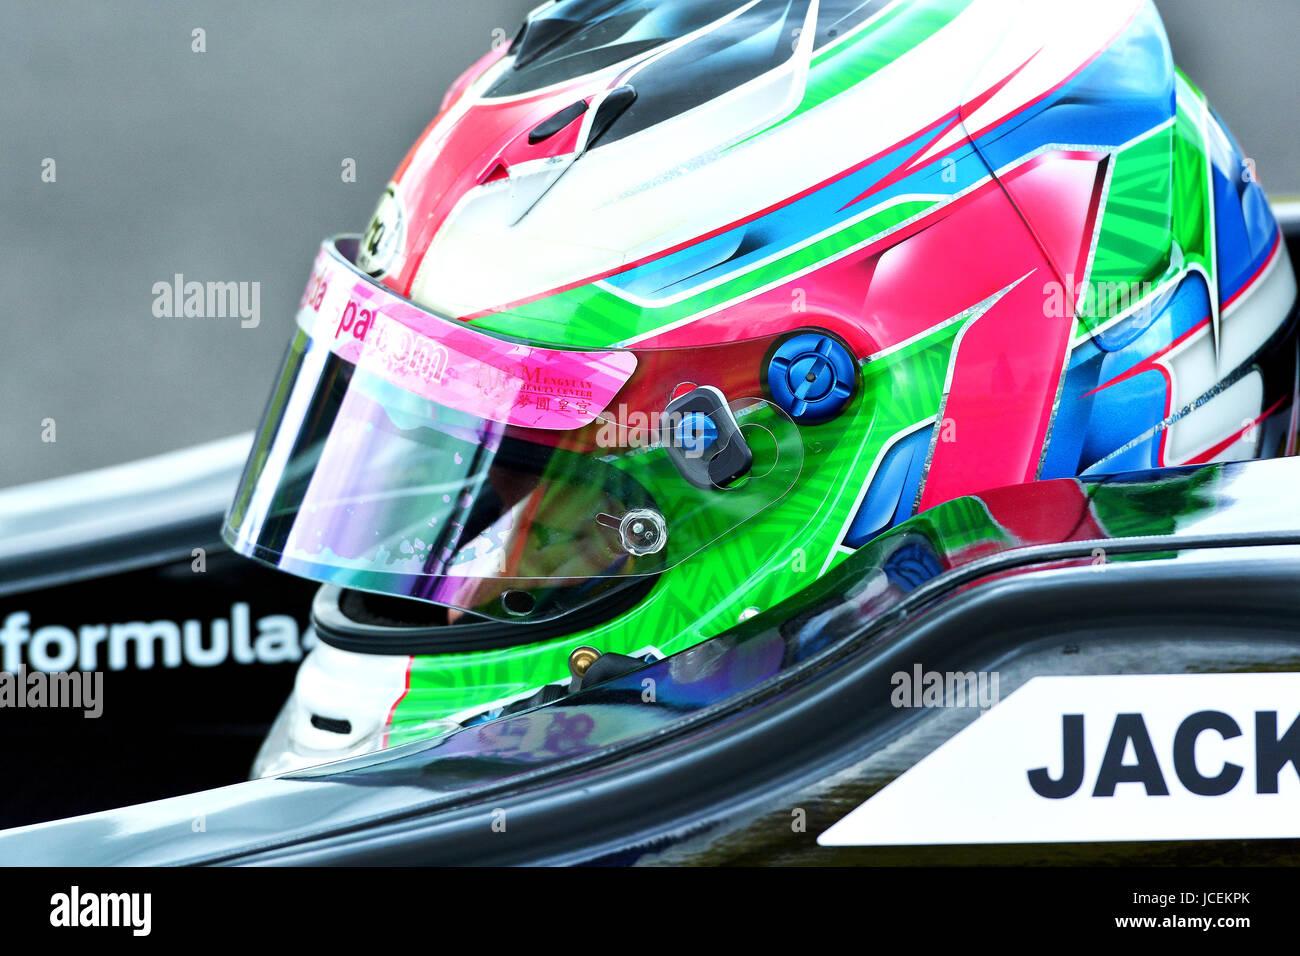 Formula Ford  Driver racing at the British Touring Car Championship - Stock Image